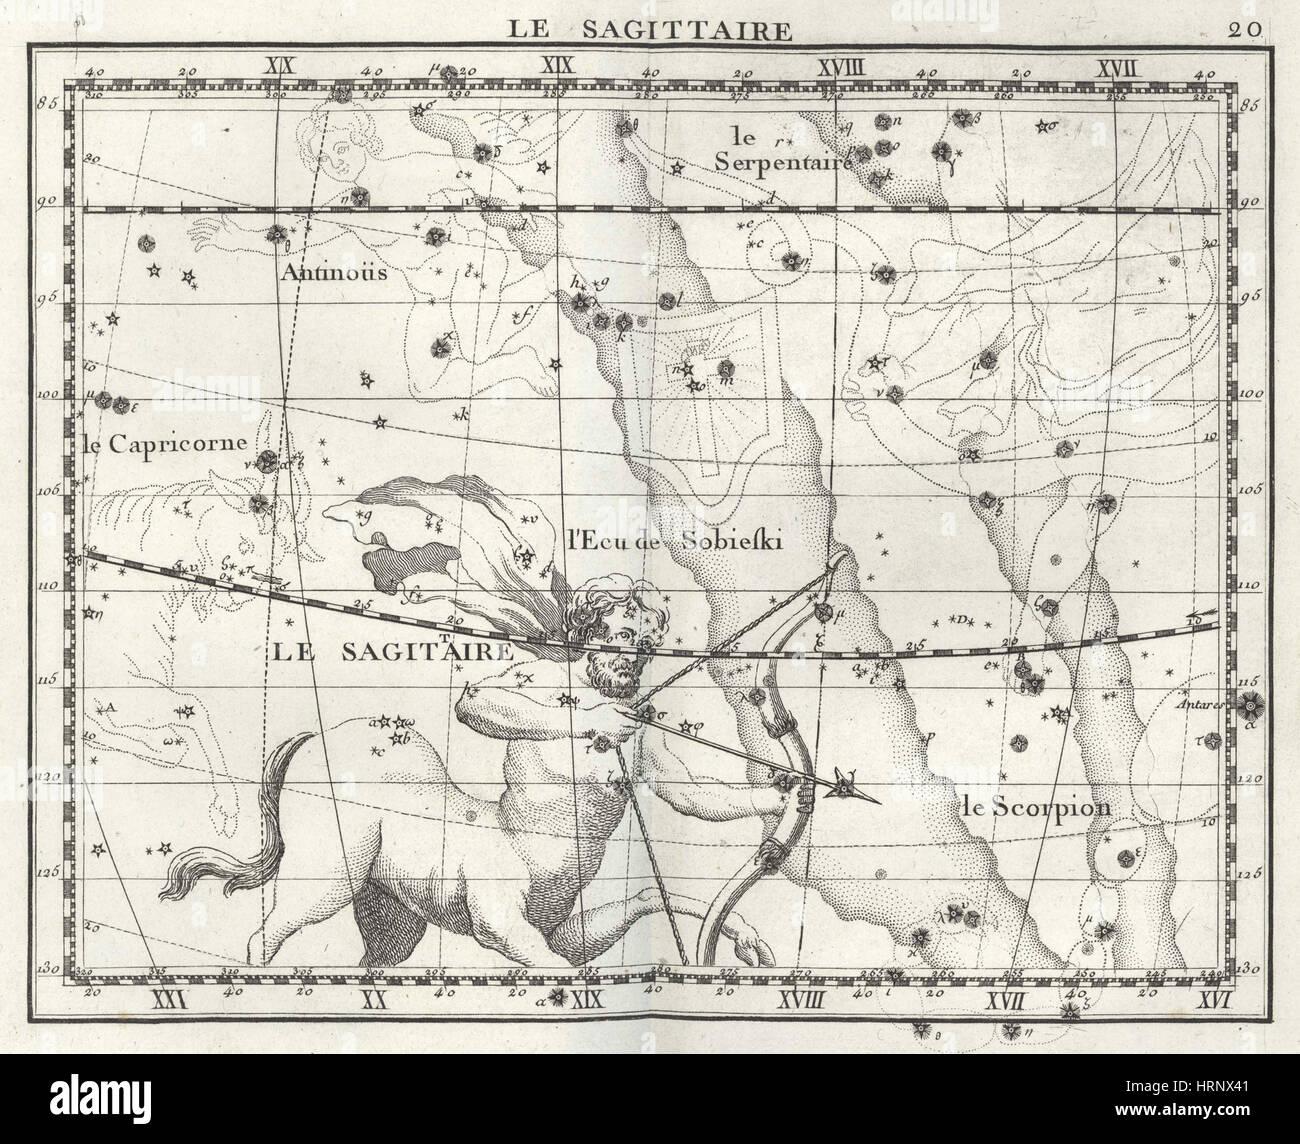 Sagittarius Constellation, Zodiac, 1729 Stock Photo